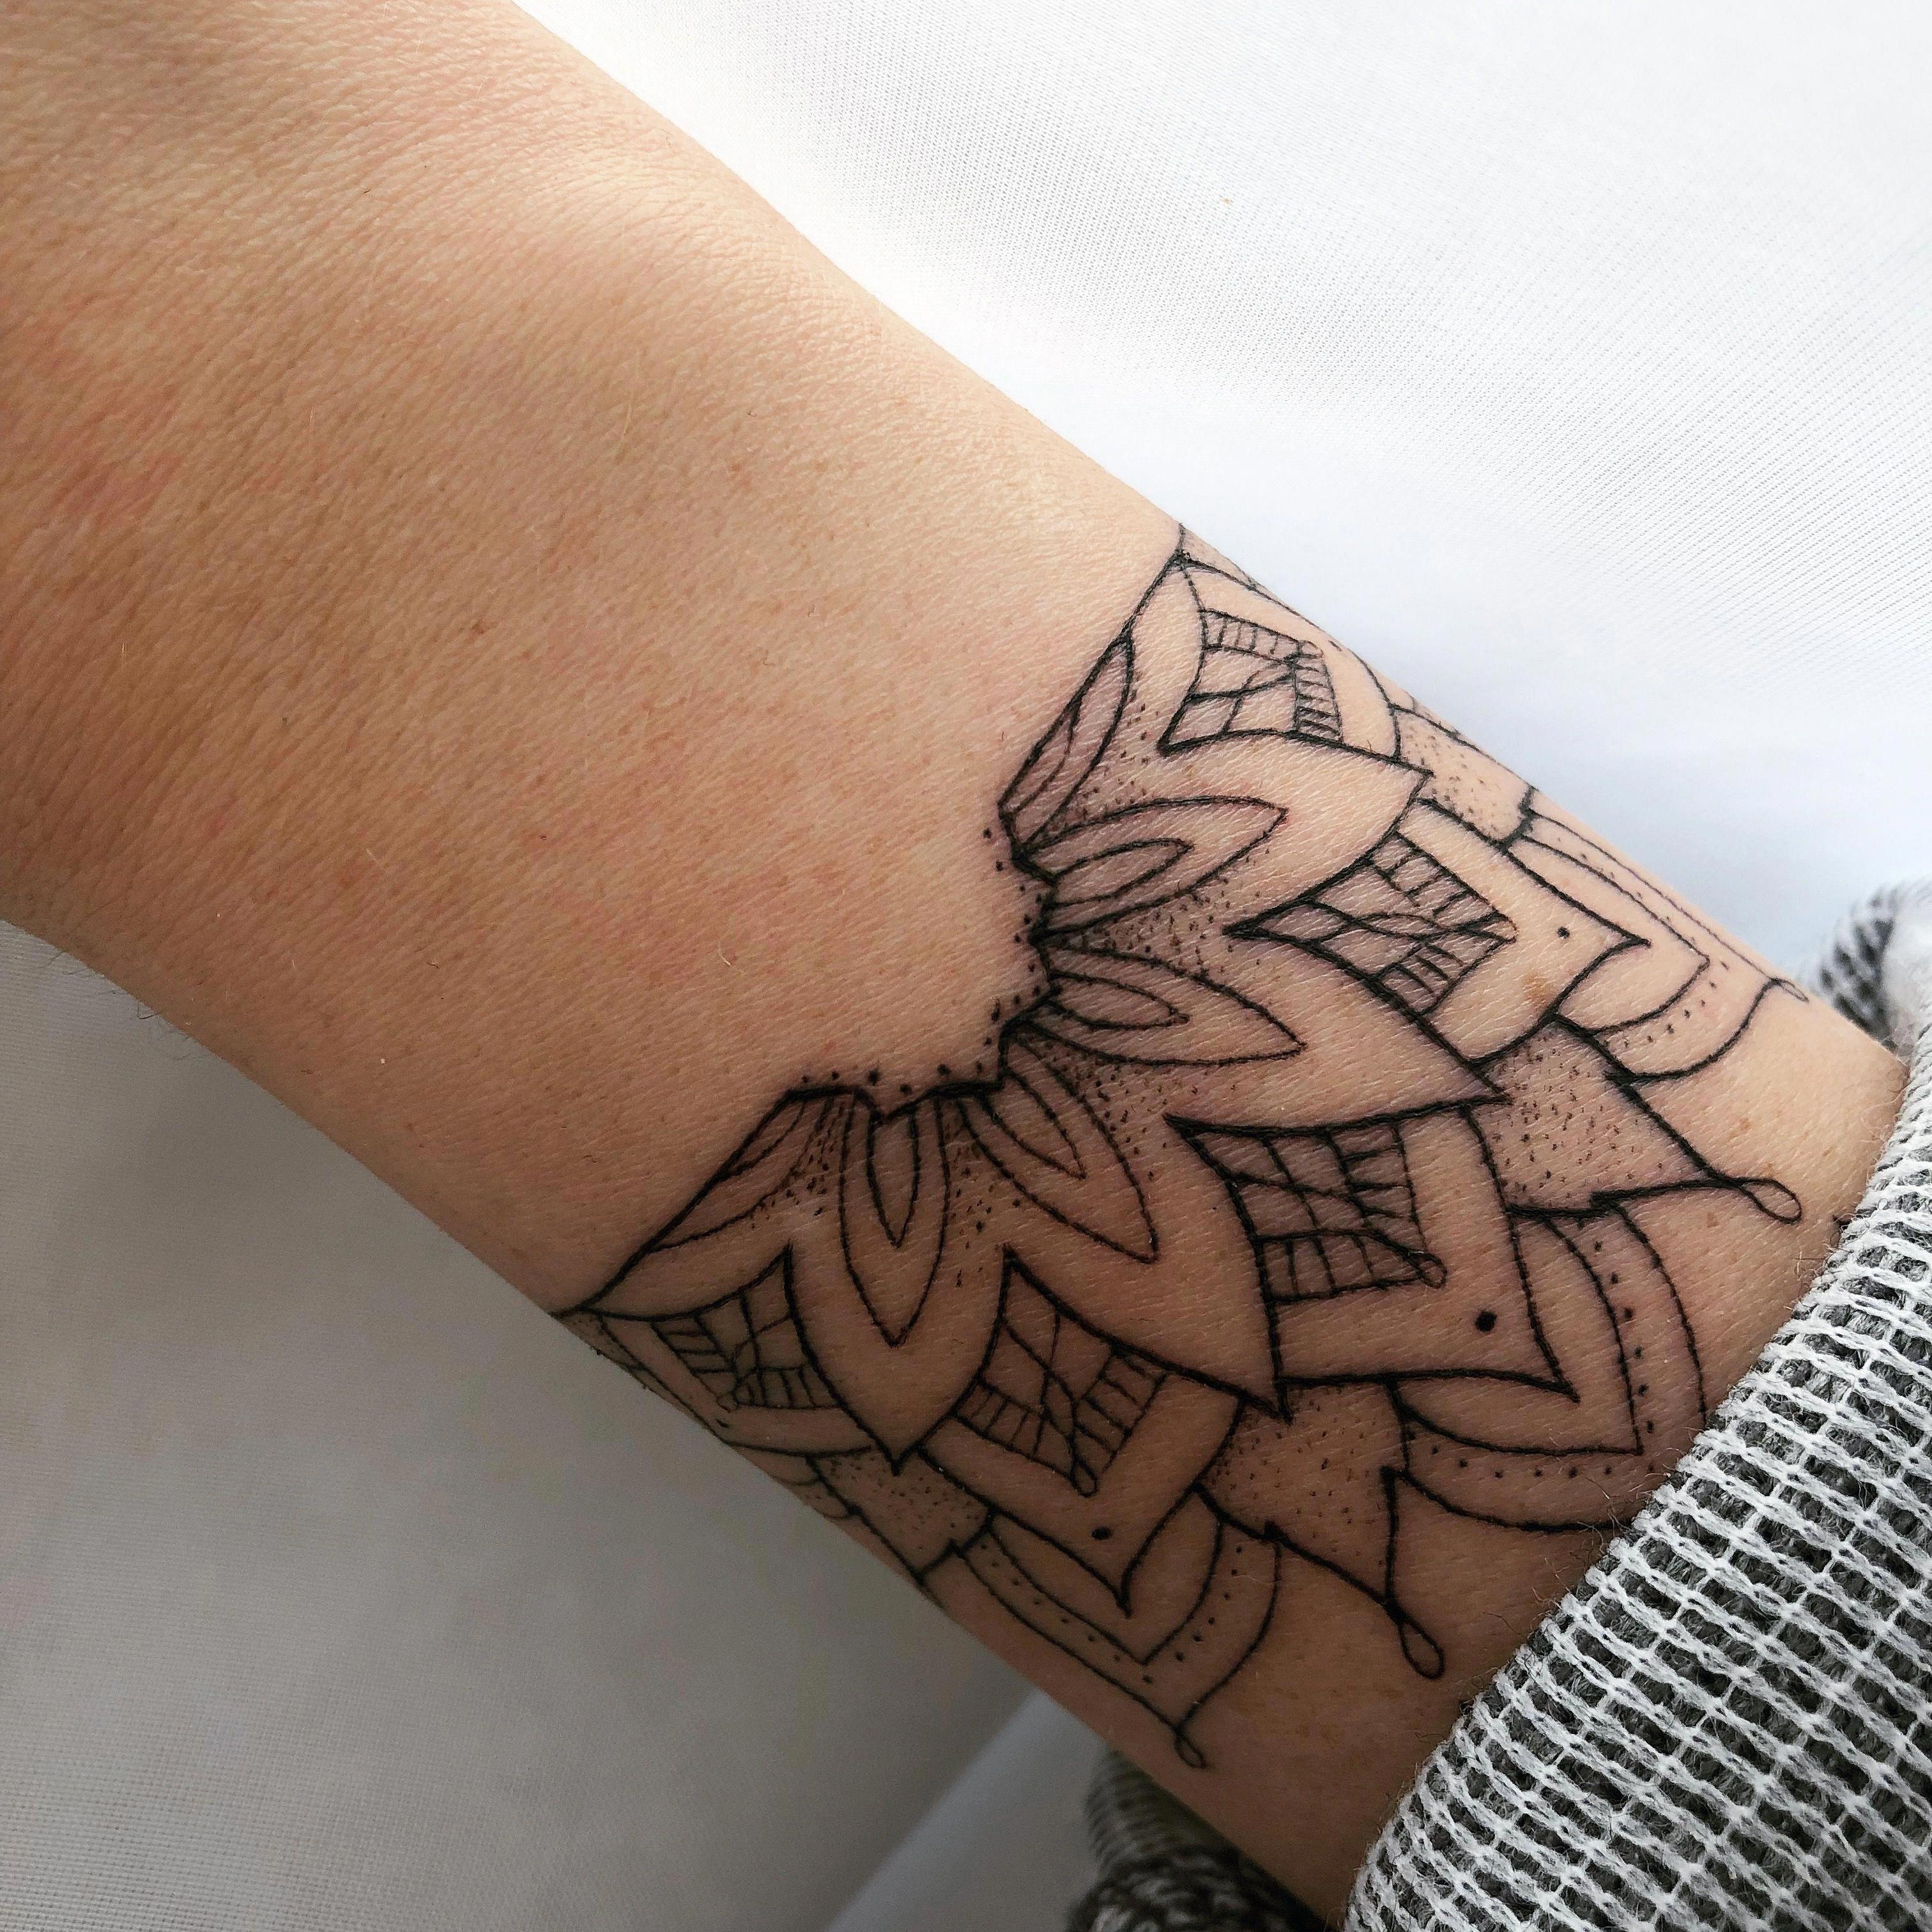 Botanical tattoo, it looks so real. Definitely this kind